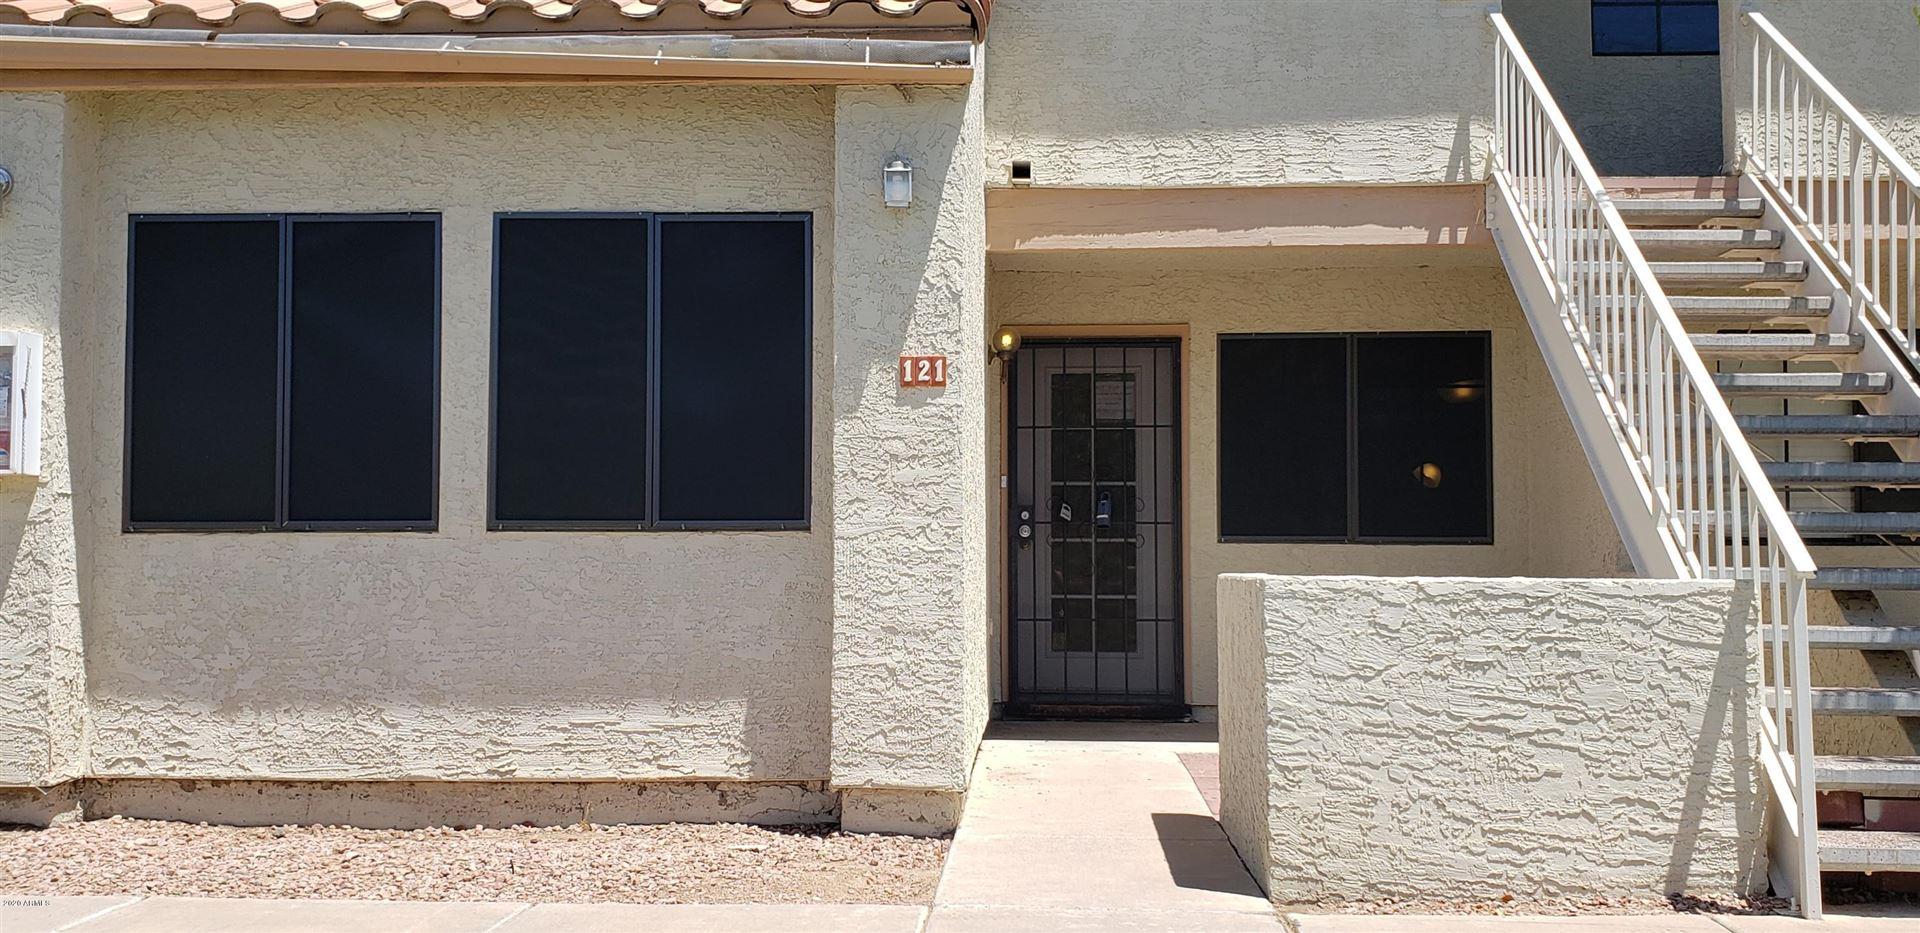 19820 N 13TH Avenue #121, Phoenix, AZ 85027 - #: 6101067